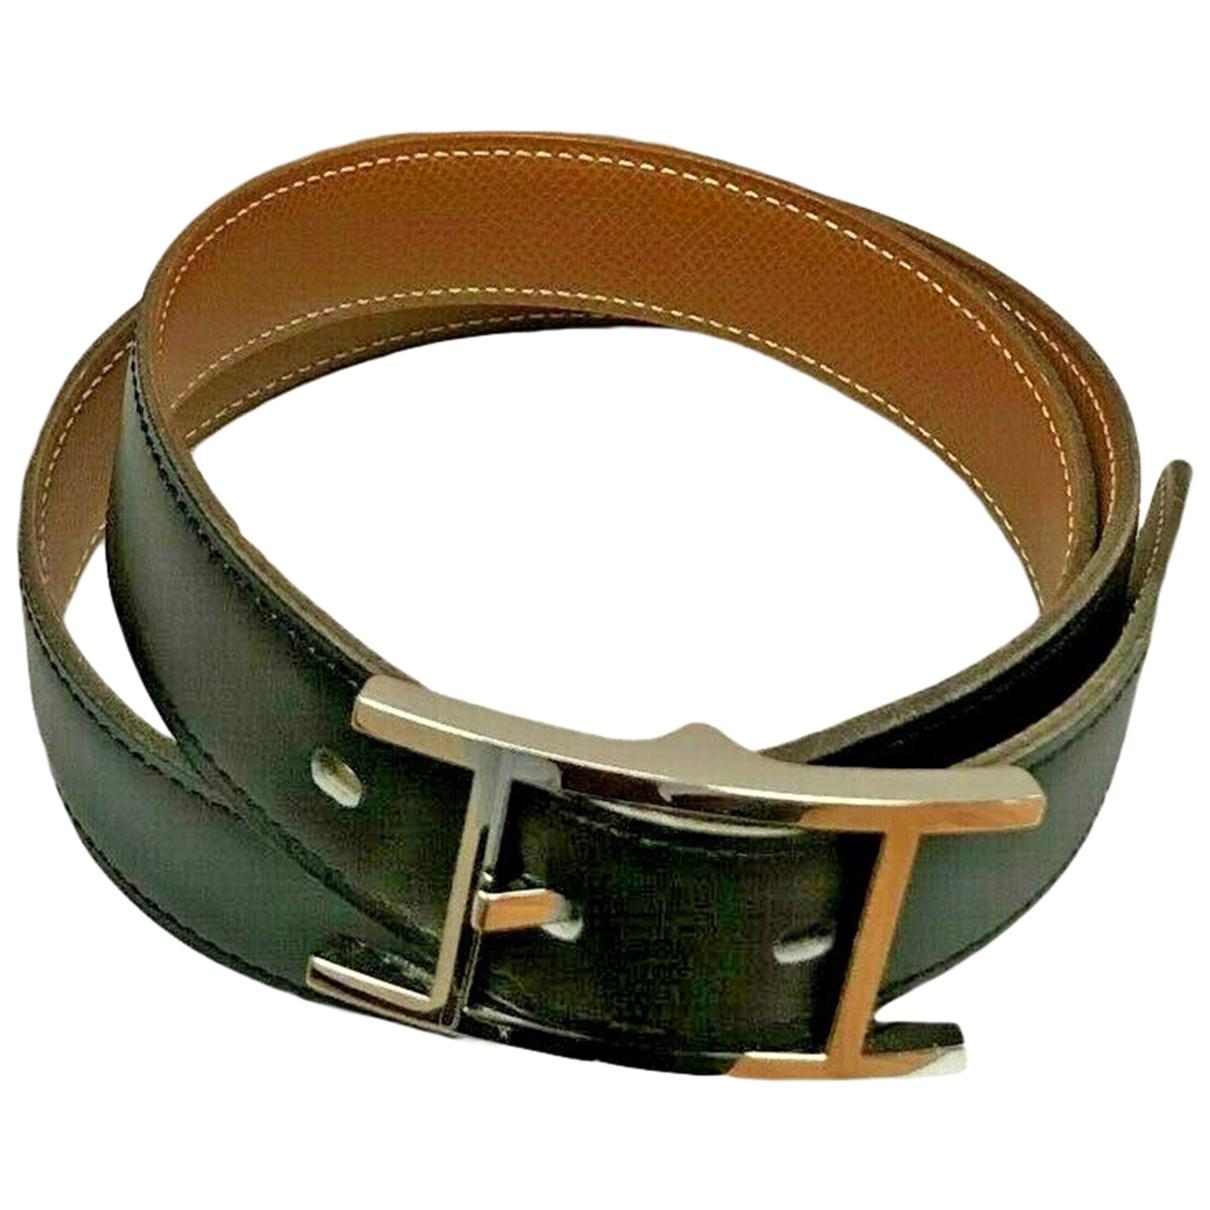 Cinturon Quentin de Cuero Hermes